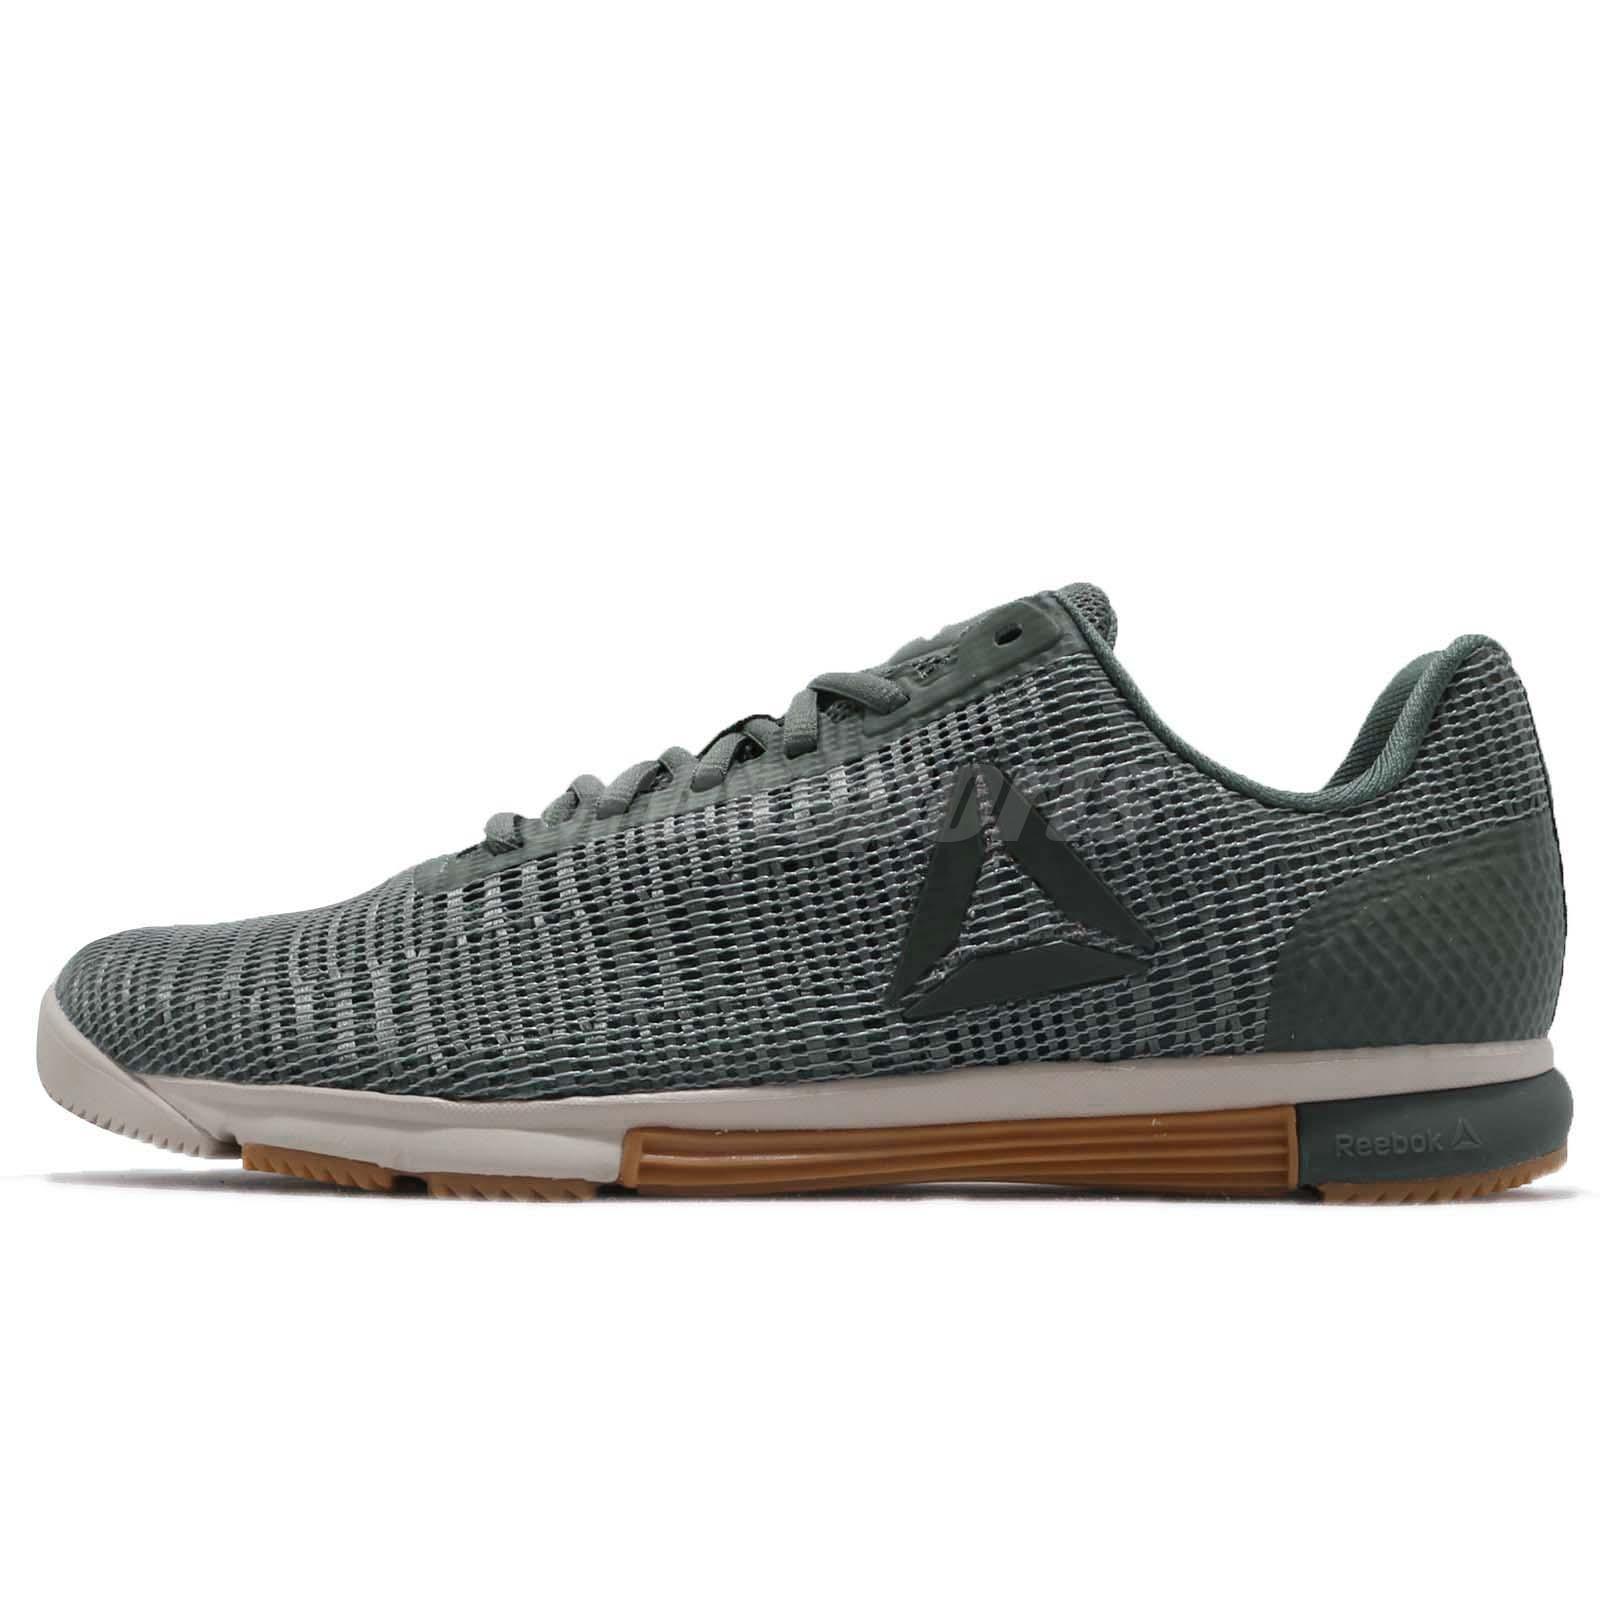 Reebok Speed TR Flexweave Green Gum Men Cross Training Shoes Sneakers CN5501 4daa8e5b2